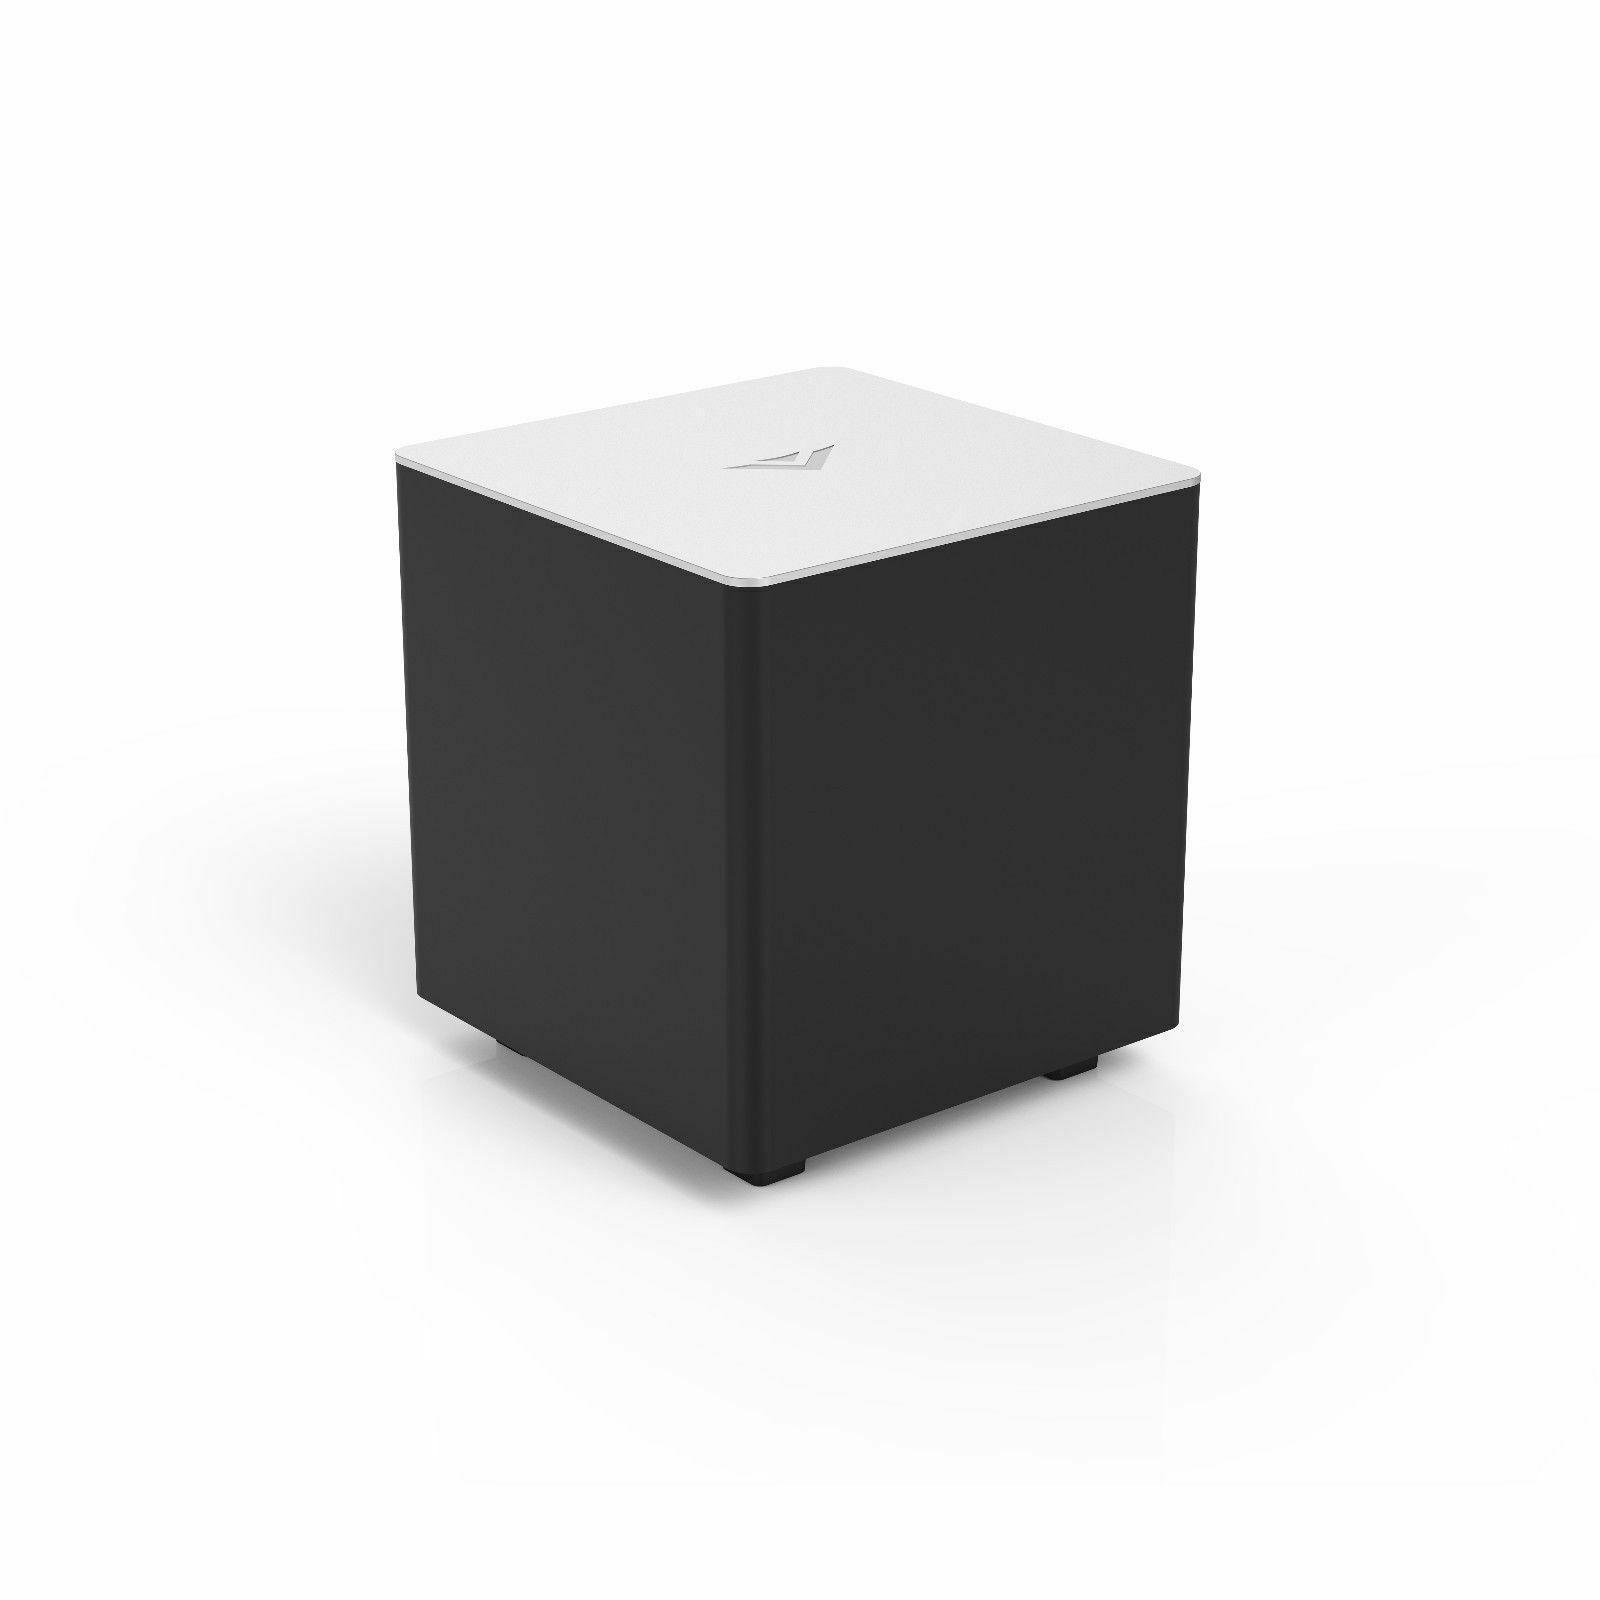 VIZIO SB3851-D0 SmartCast 5.1 Sound Bar System